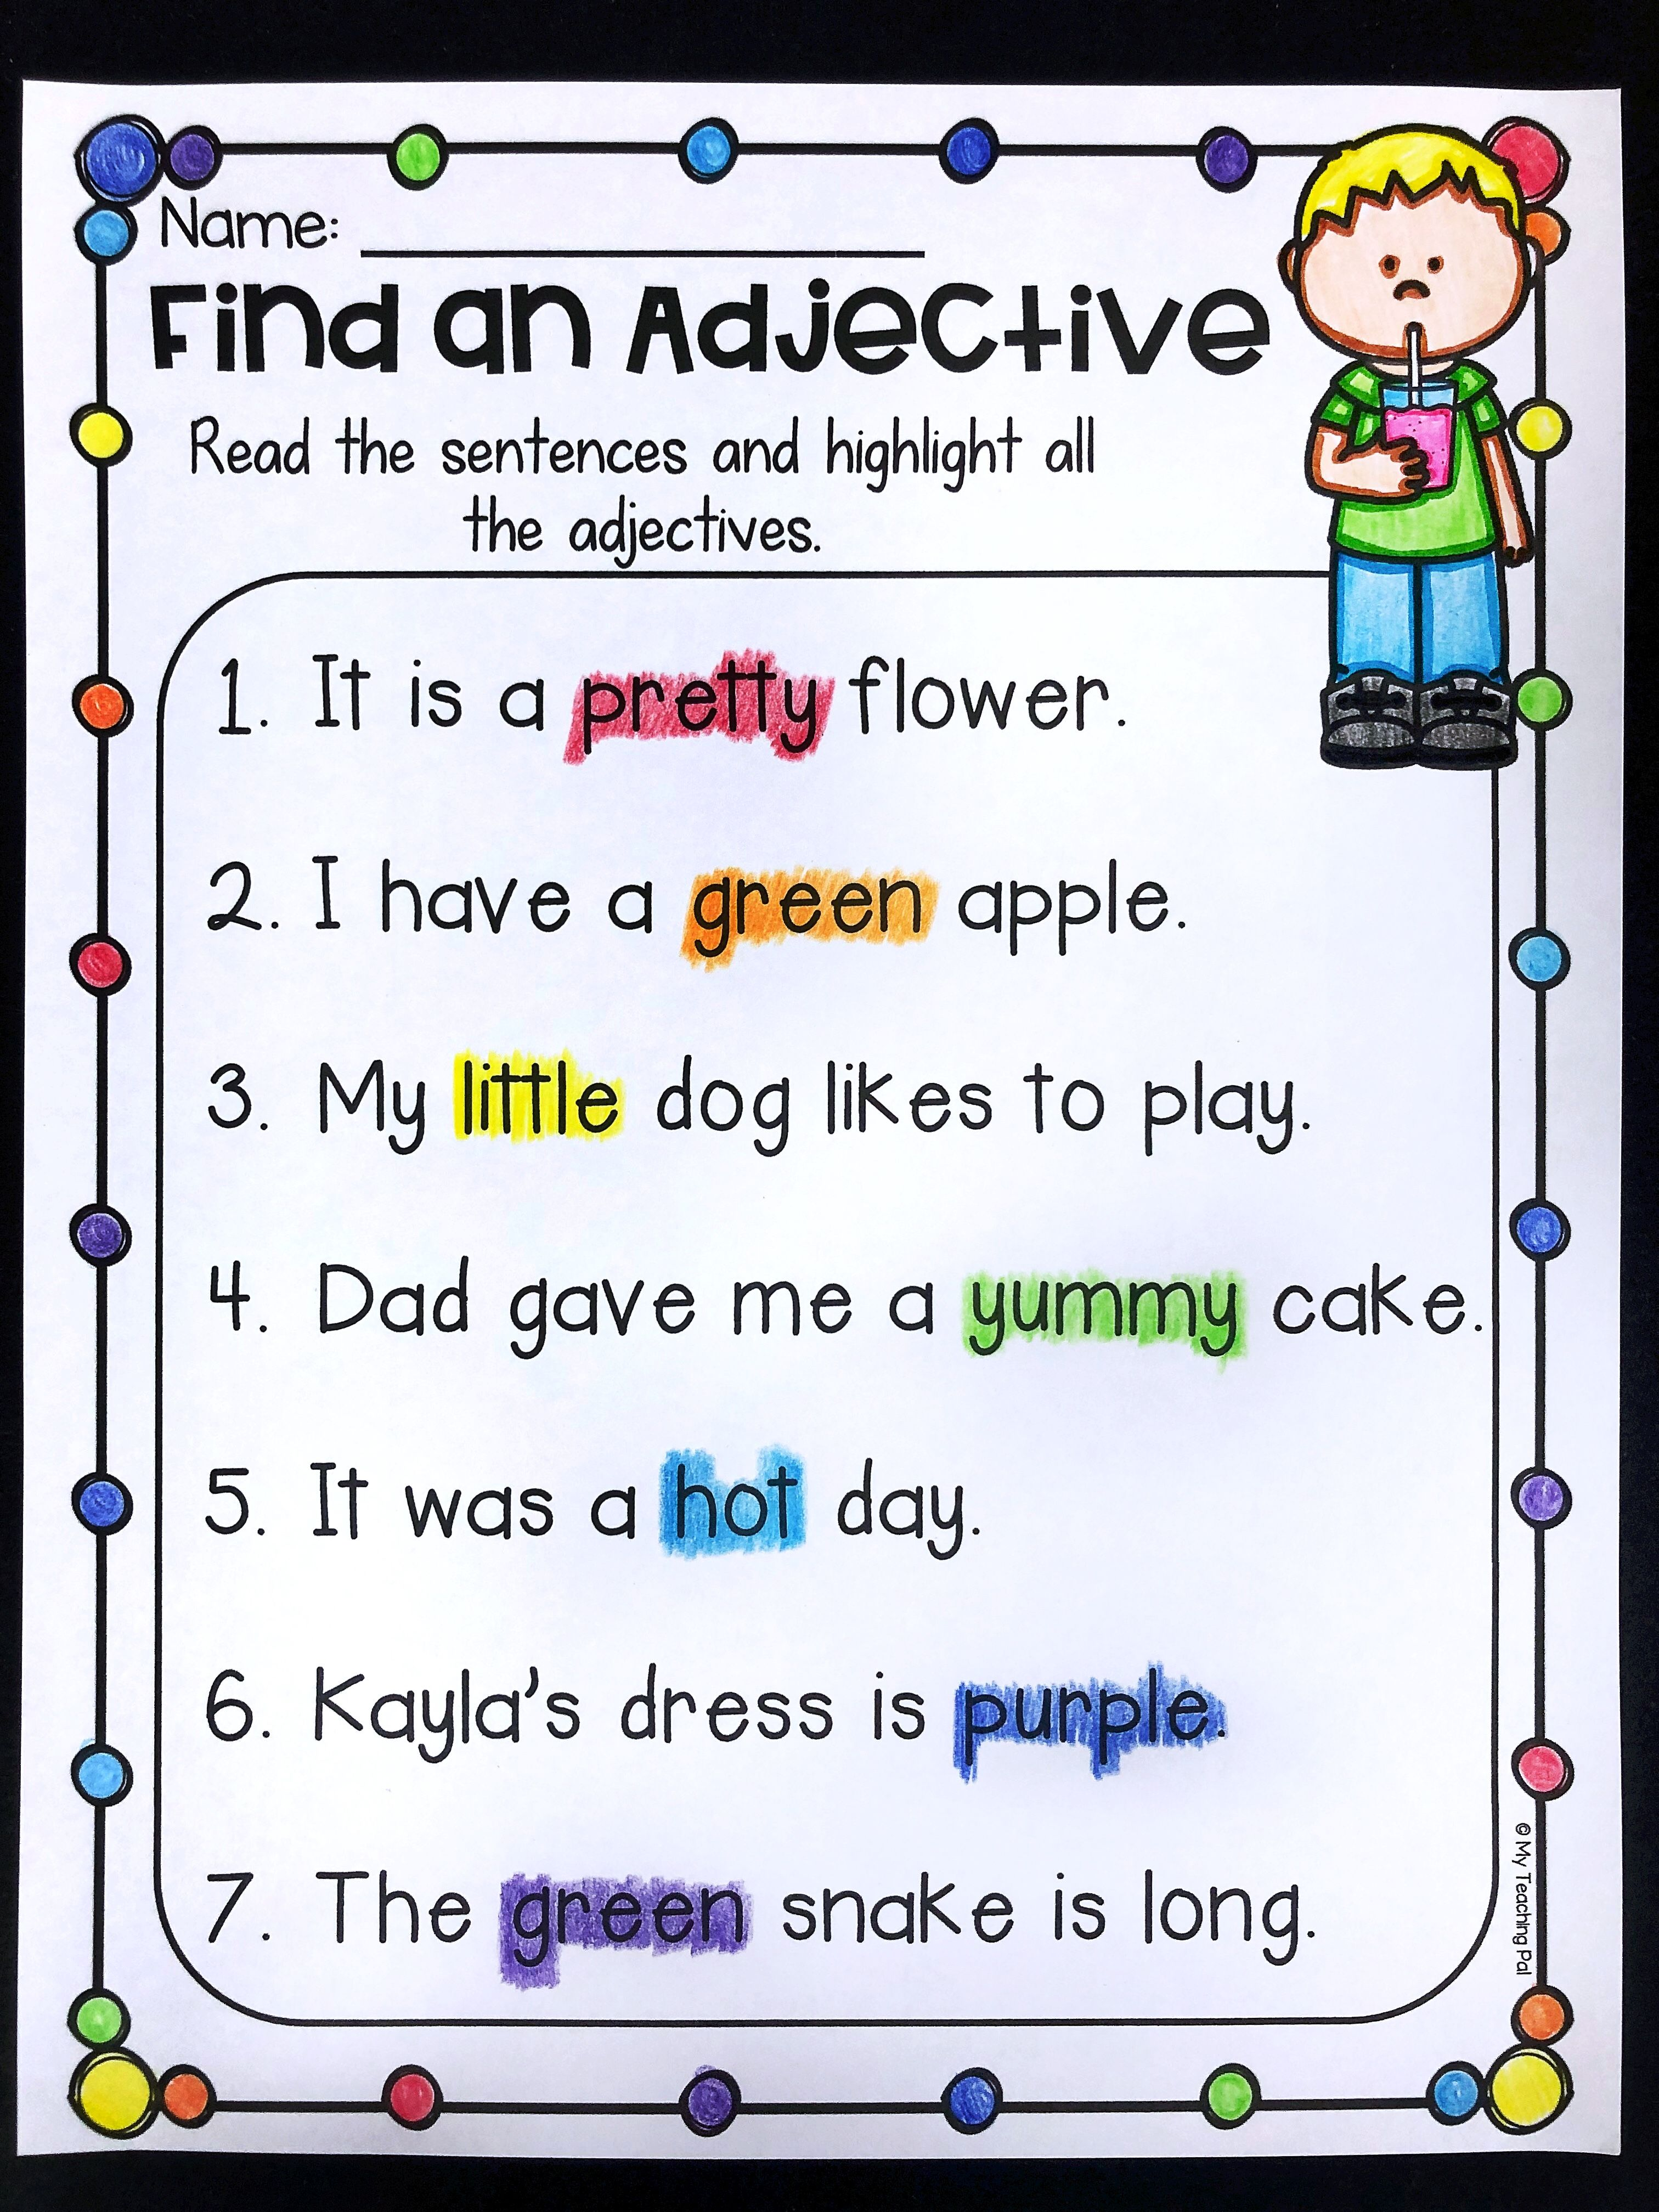 Grammar Worksheet Packet Nouns Adjectives And Verbs Worksheets Adjective Worksheet Teaching Adjectives Grammar Worksheets